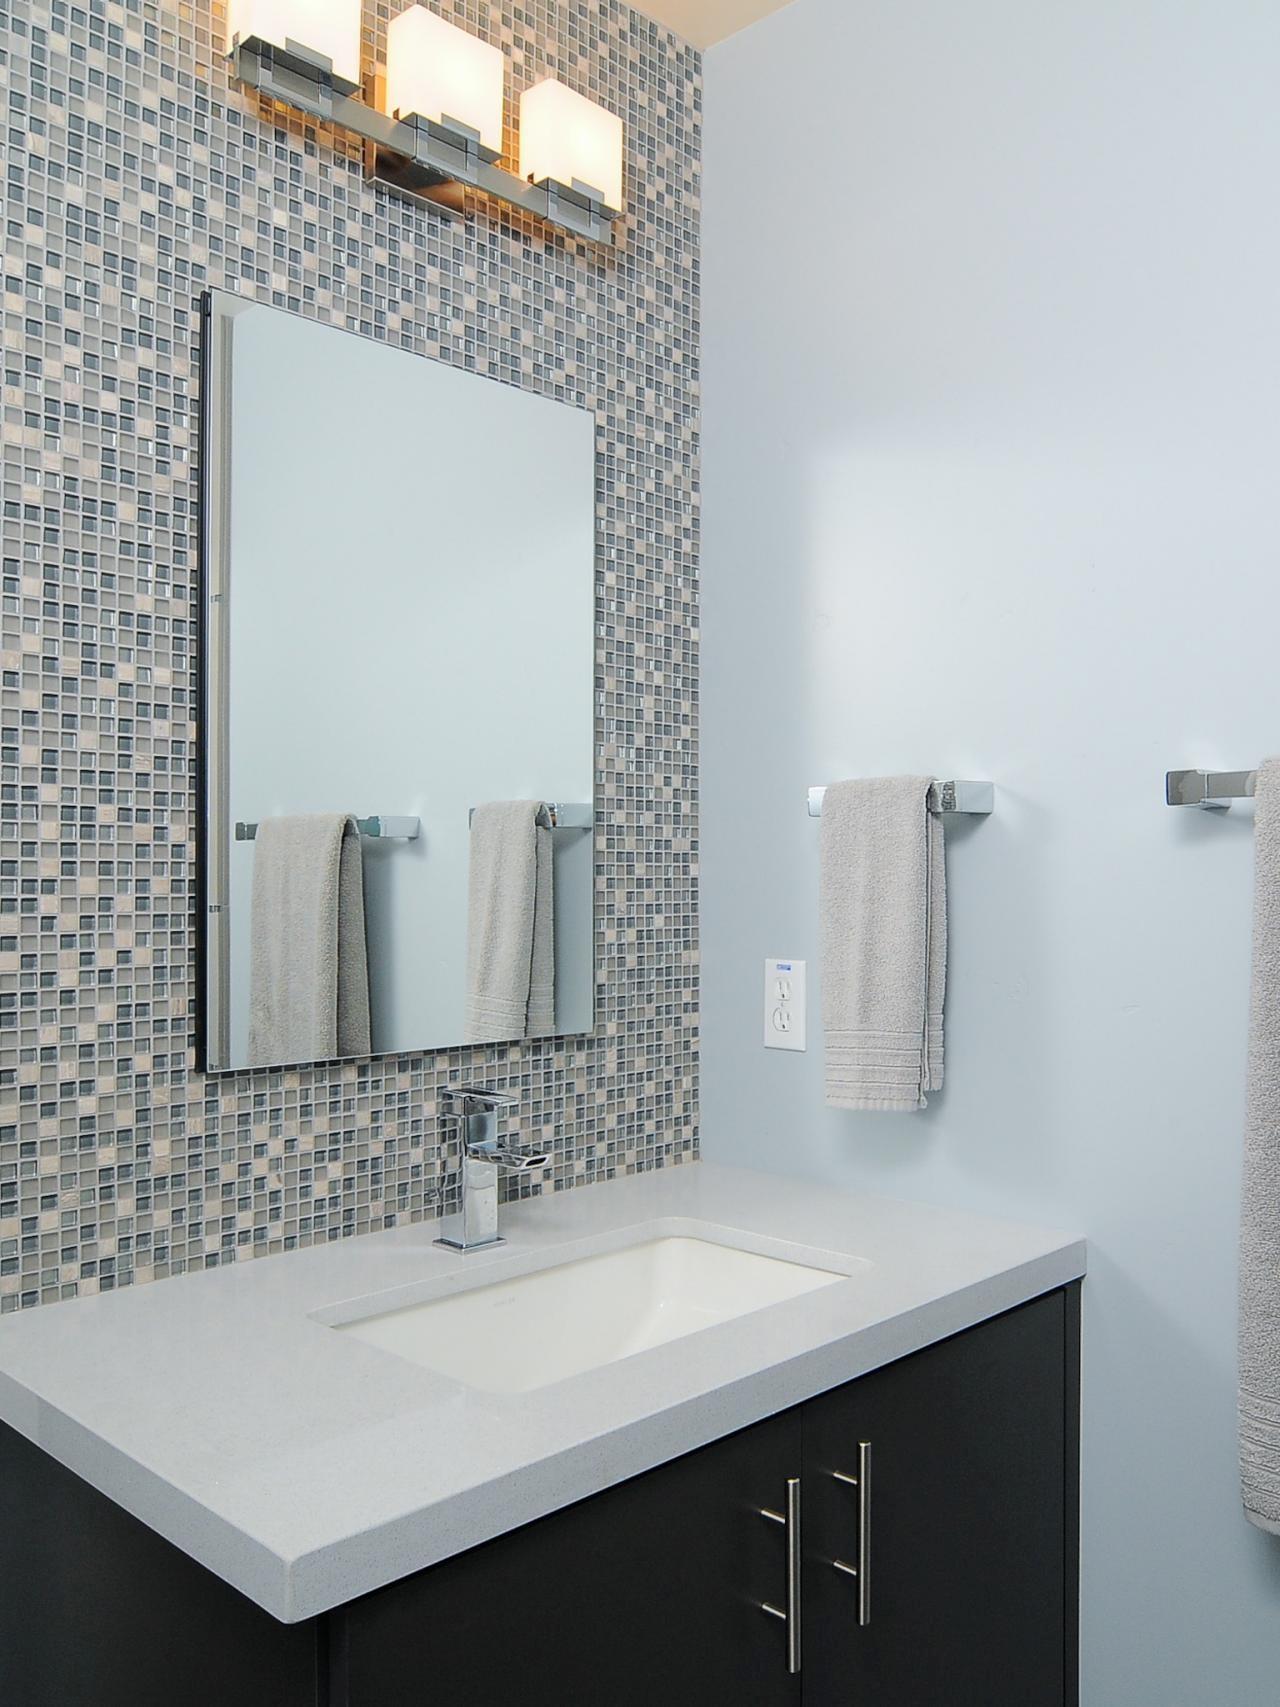 Bathroom Accent Tile Amazing Bathrooms Design Stone Tile Accent Wall Ceramic Tile Border Trim Ideas